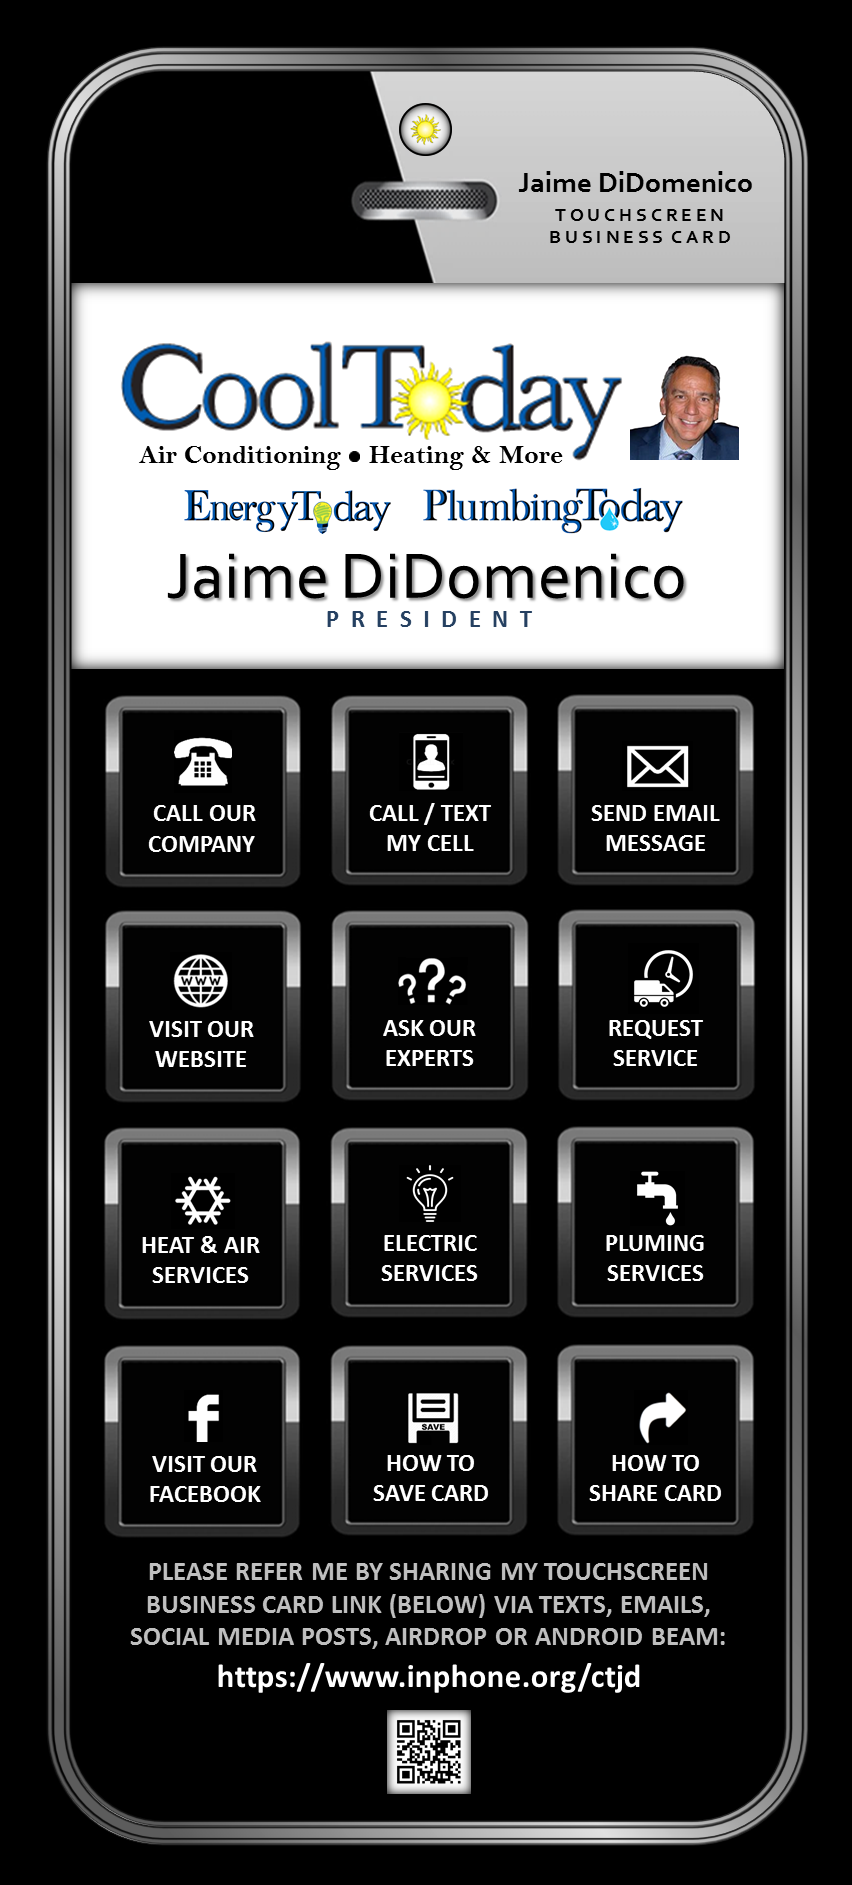 Cool Today - Jaime DiDomenico.png